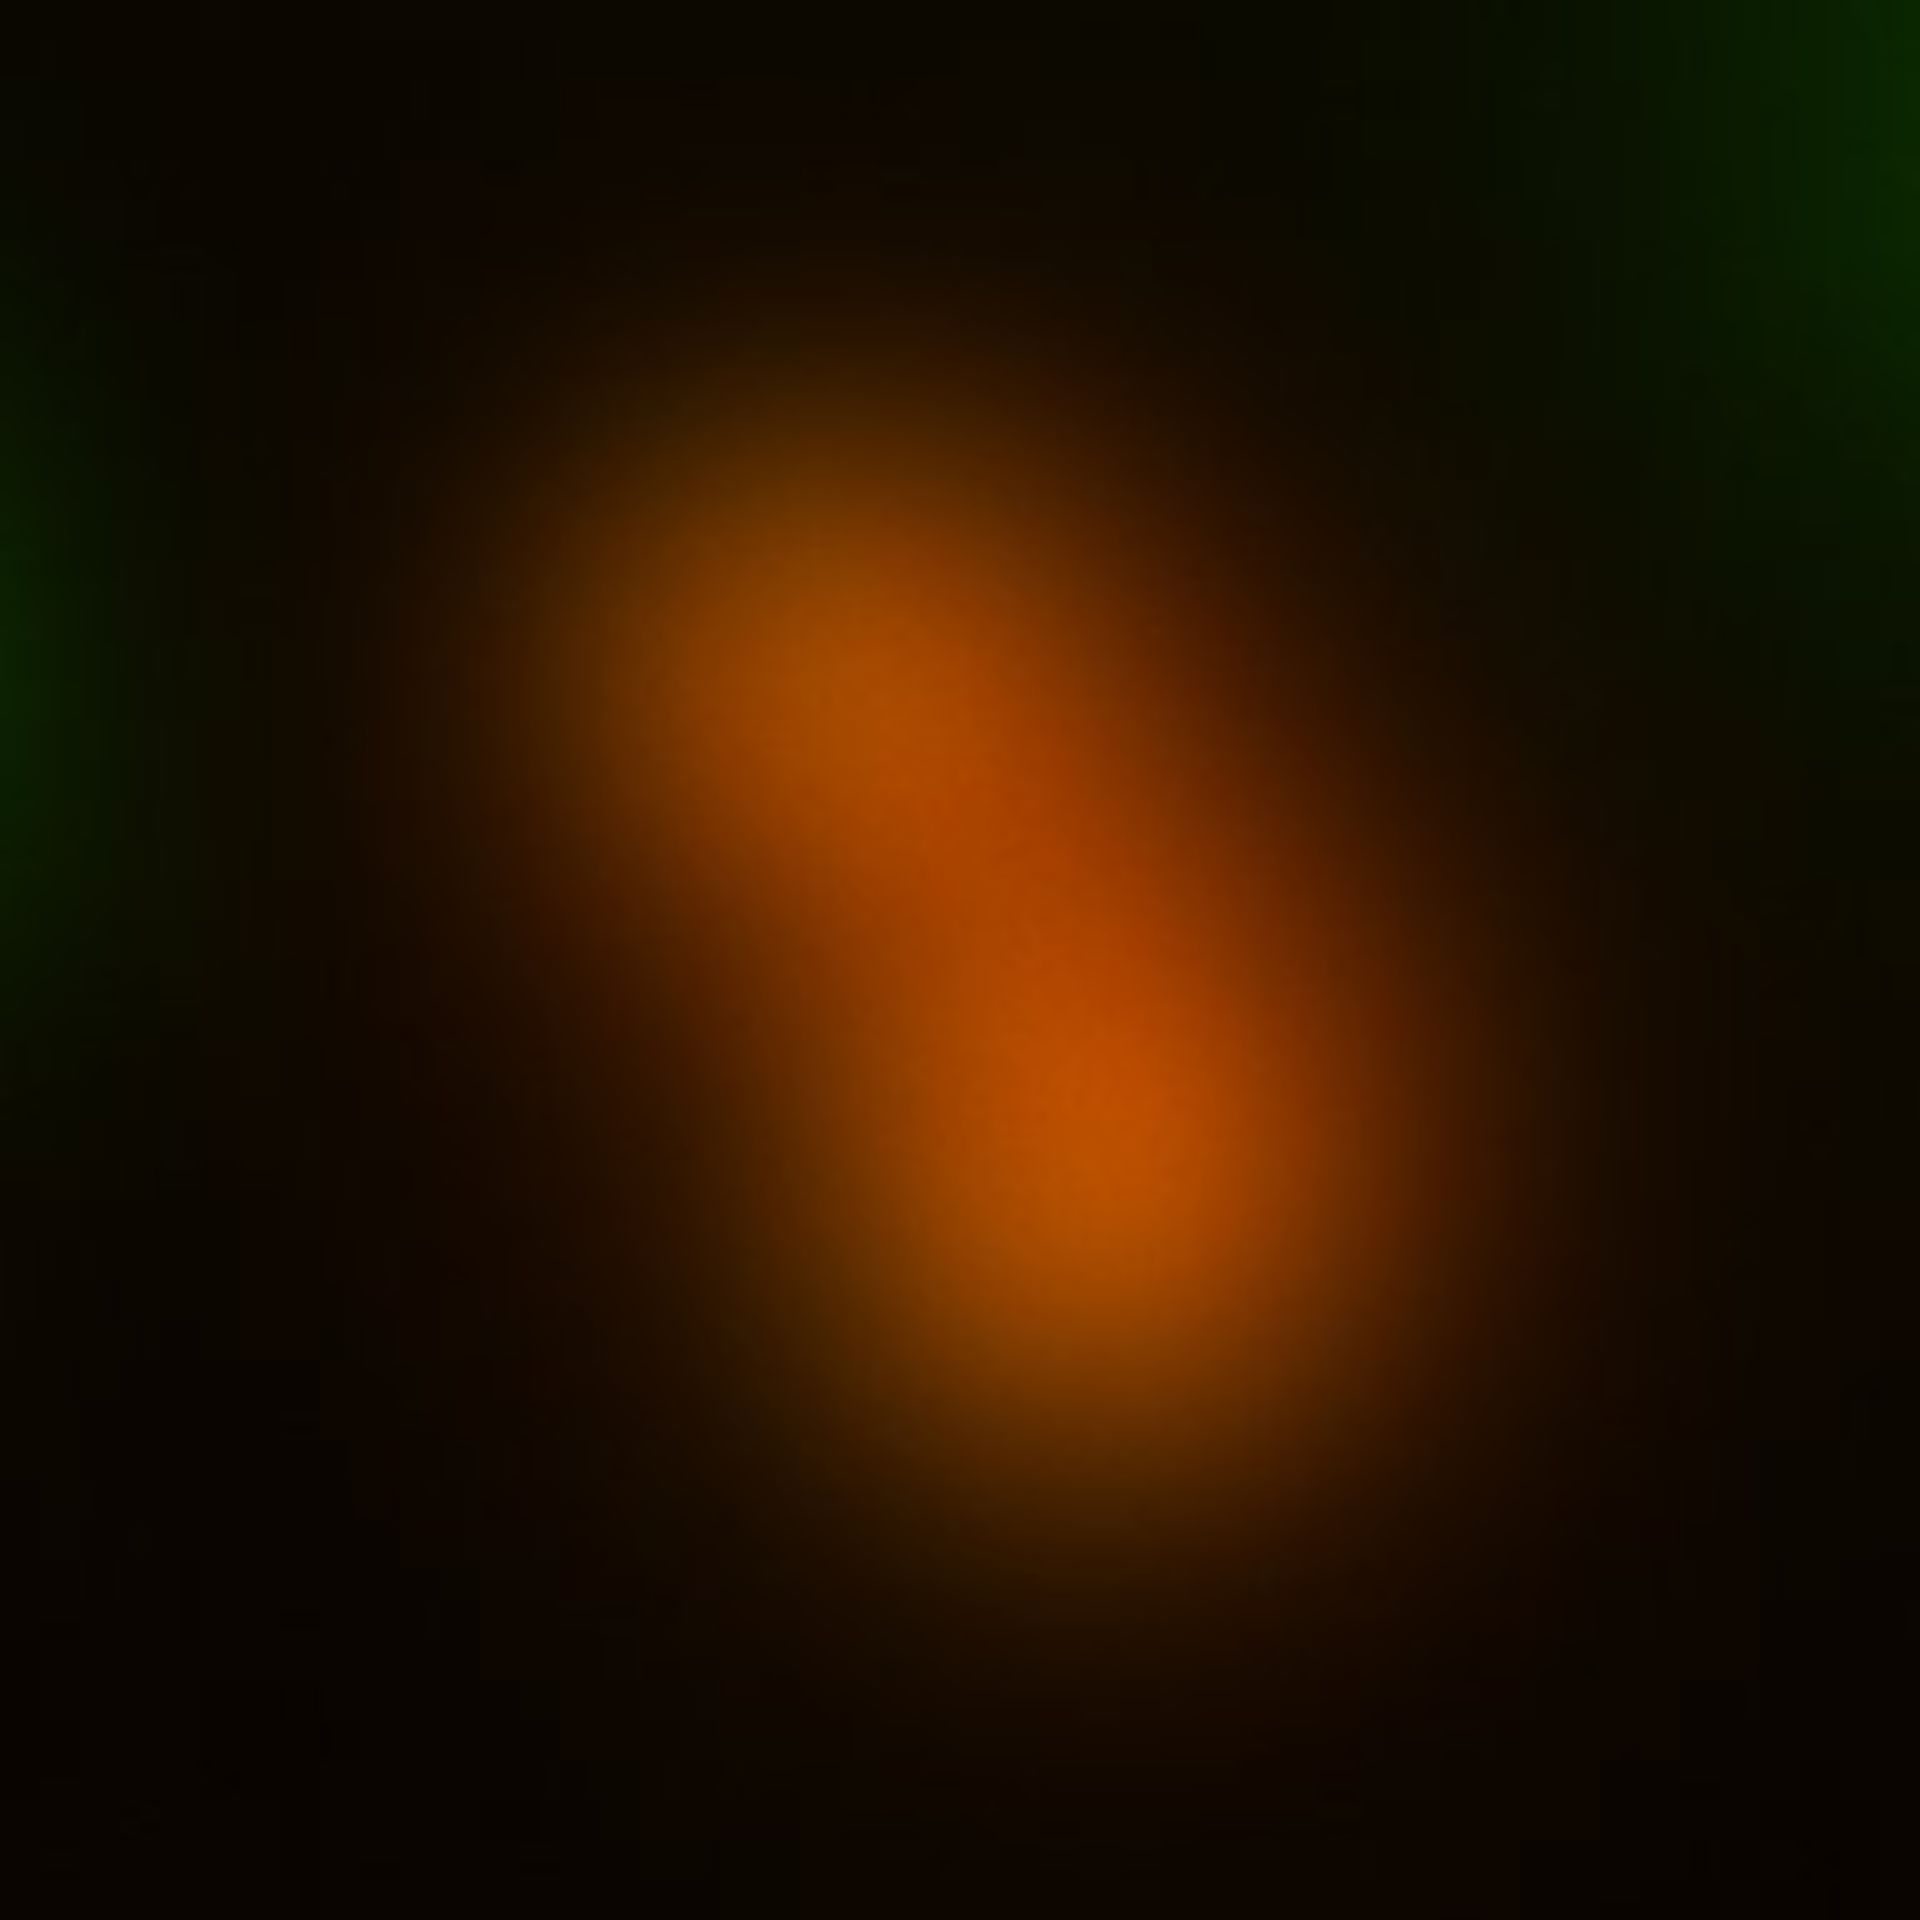 Toxoplasma gondii RH (Cortical microtubule) - CIL:10560